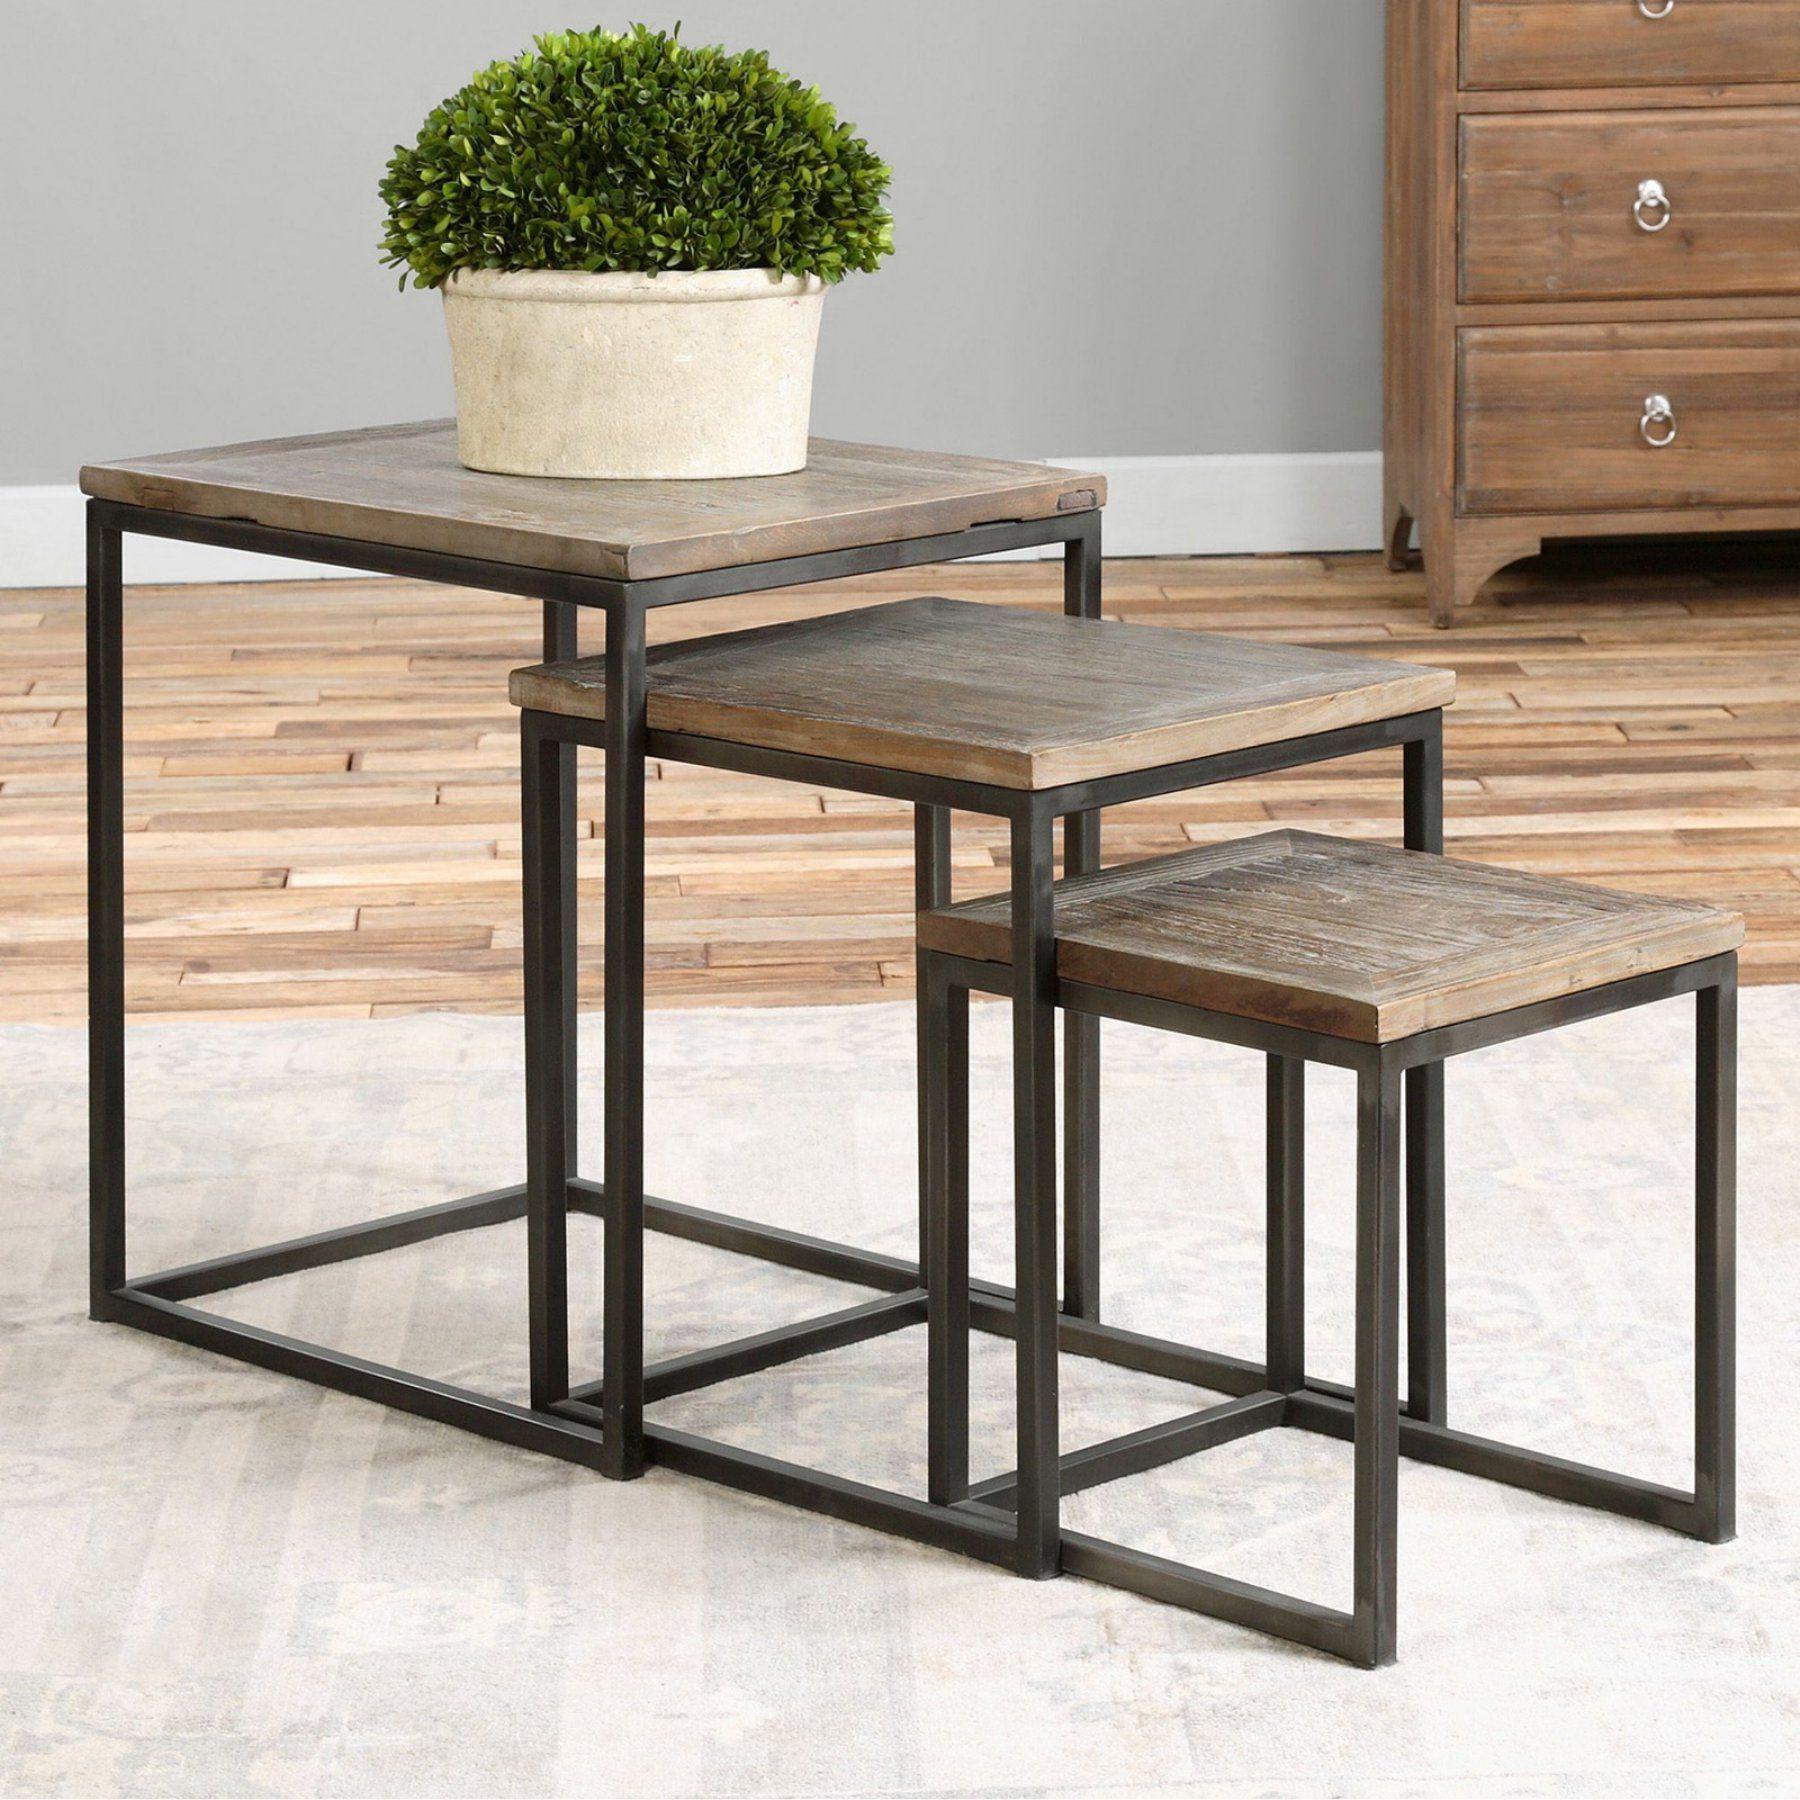 Uttermost Bomani Wood Nesting Tables - Set of 3 - 24460